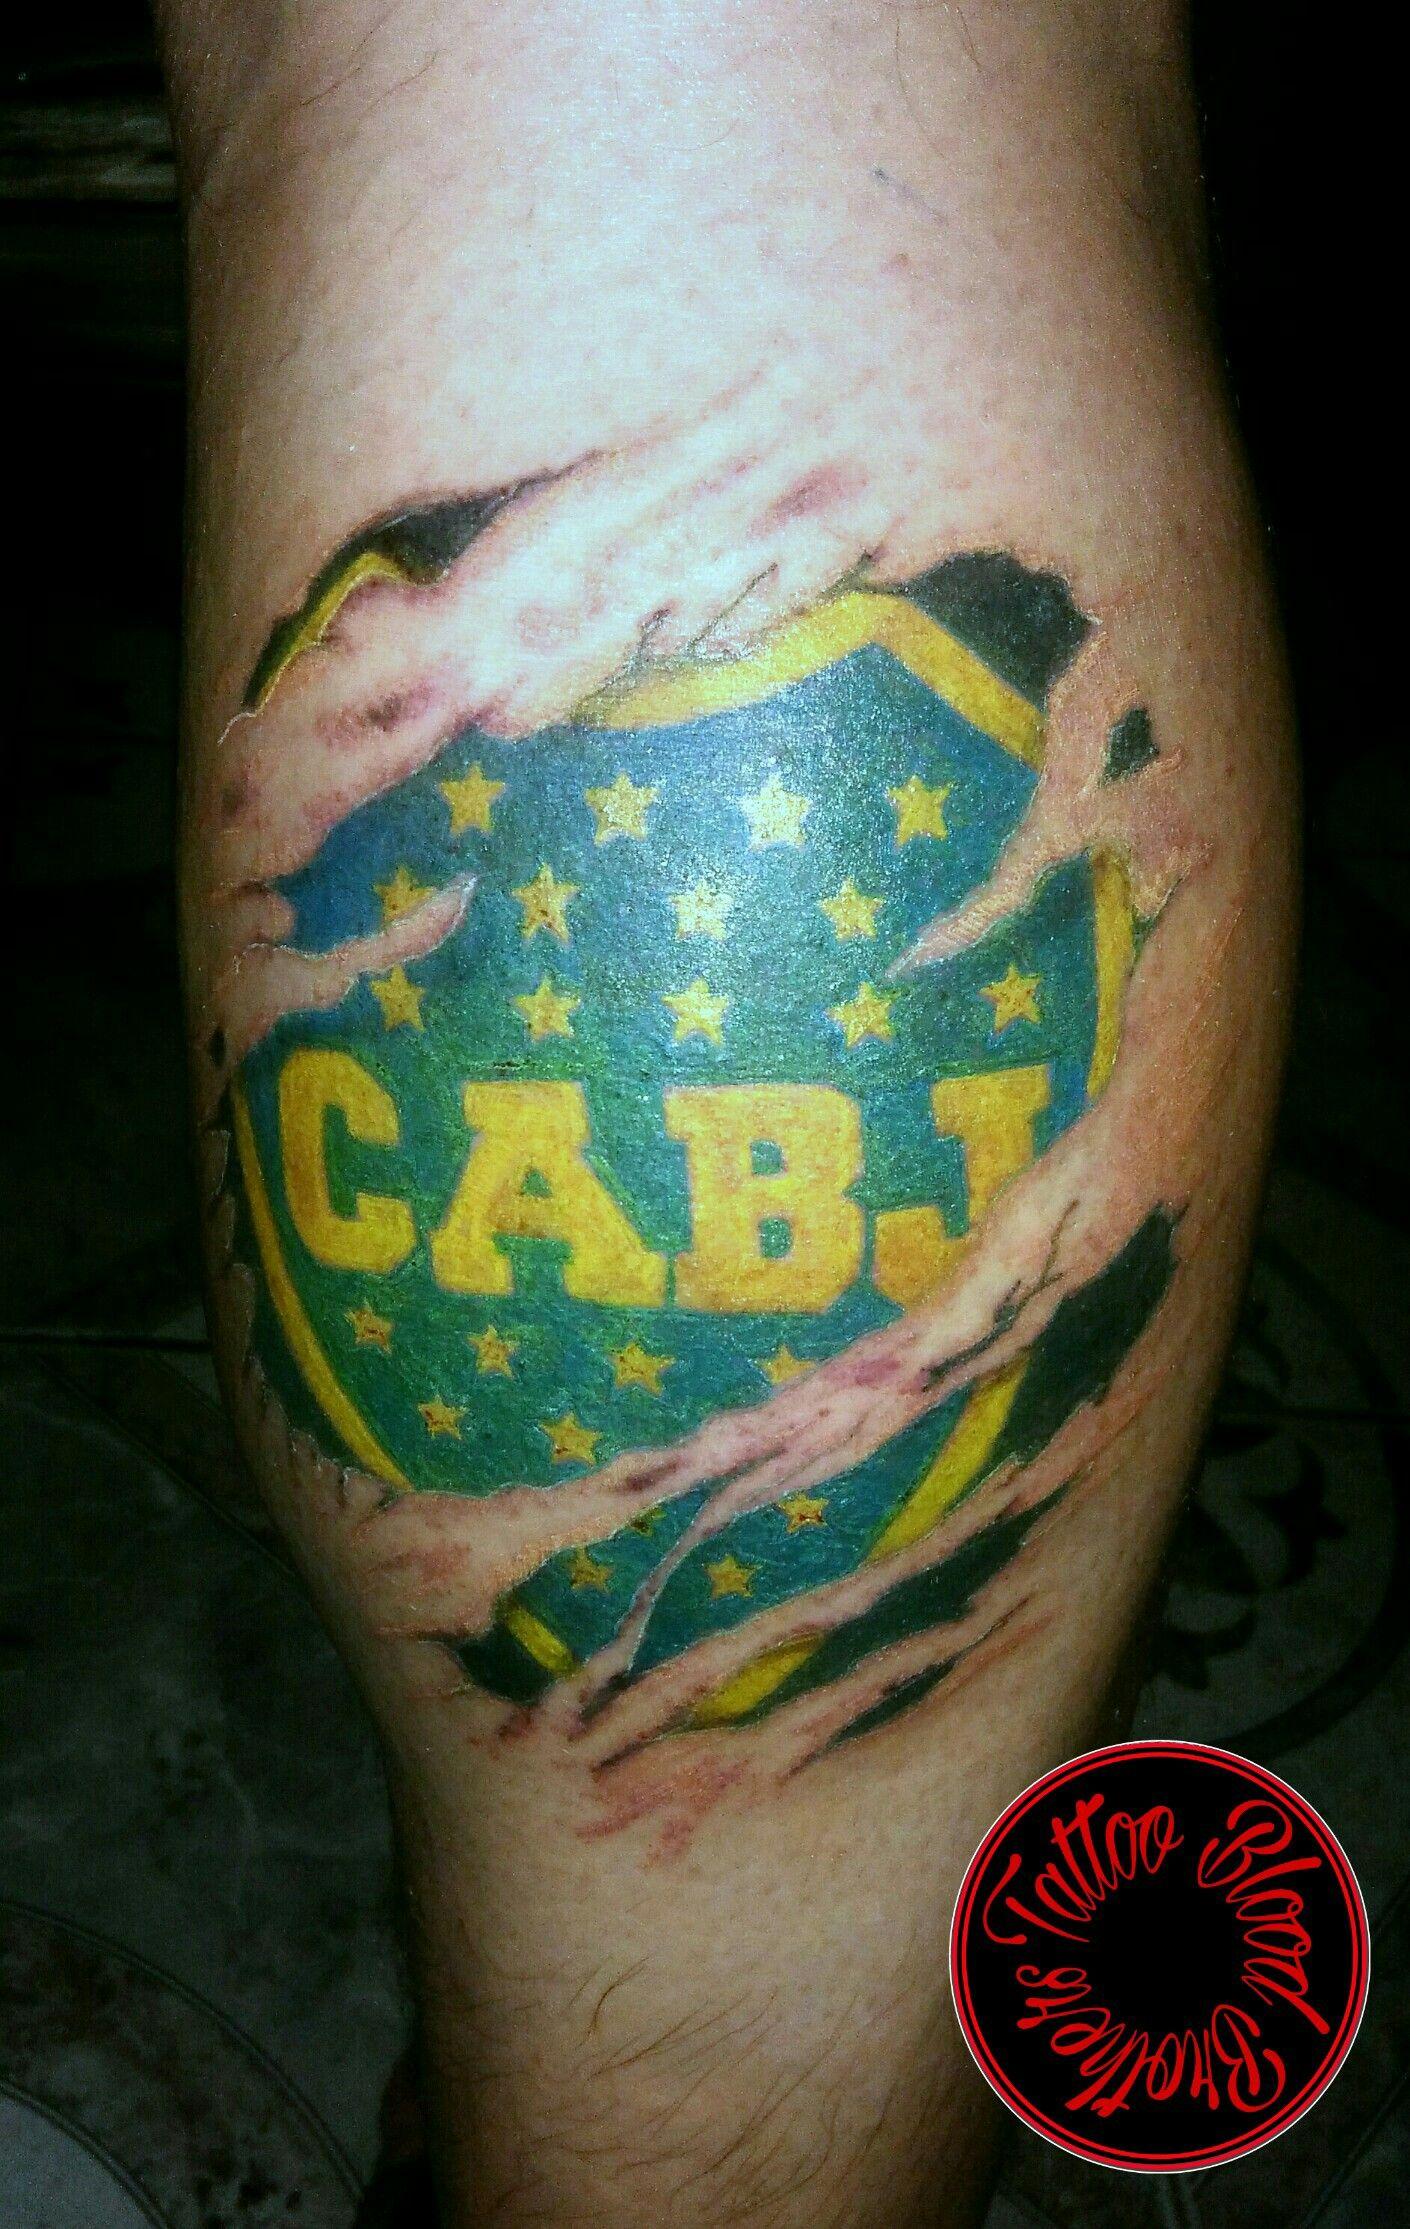 Escudo De Boca En Piel Rasgada Tatuaje De Boca Juniors Tatuajes Boca Juniors Escudo De Boca